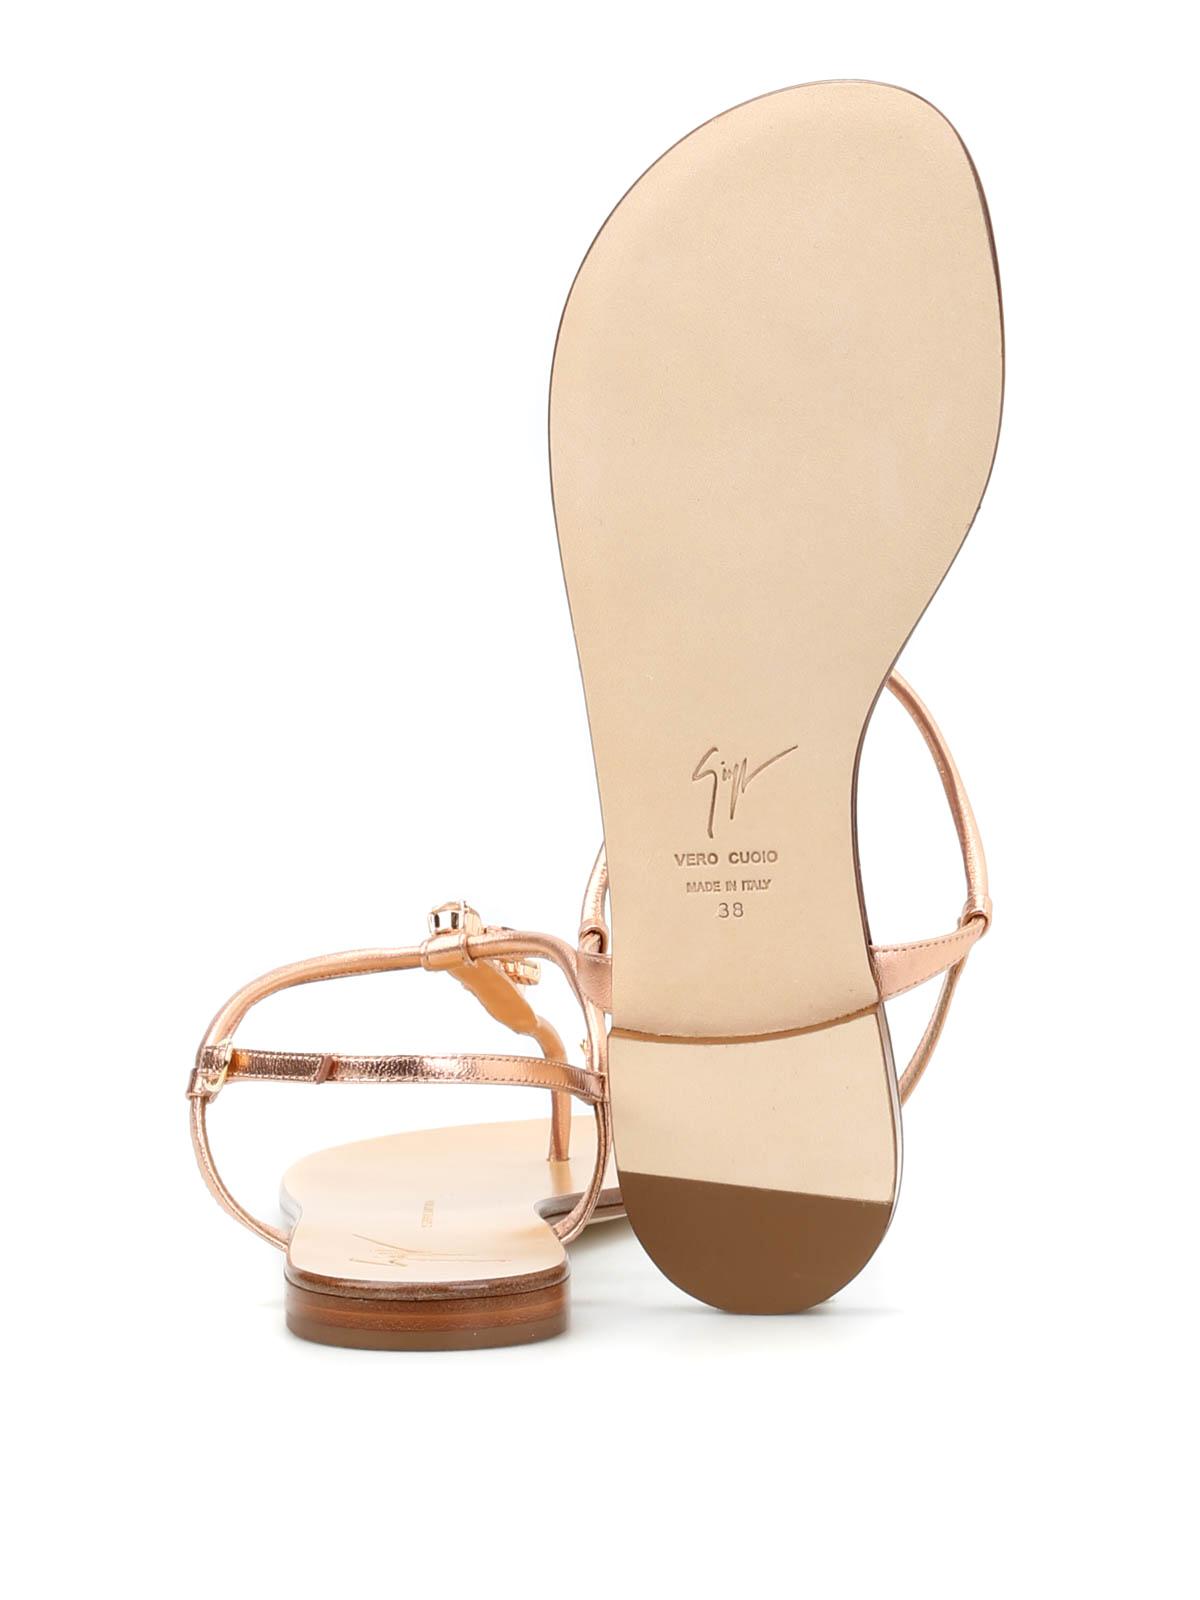 fbb82e994c30 Giuseppe Zanotti Mens Sneakers Sizing Gold Loafers For Women ...